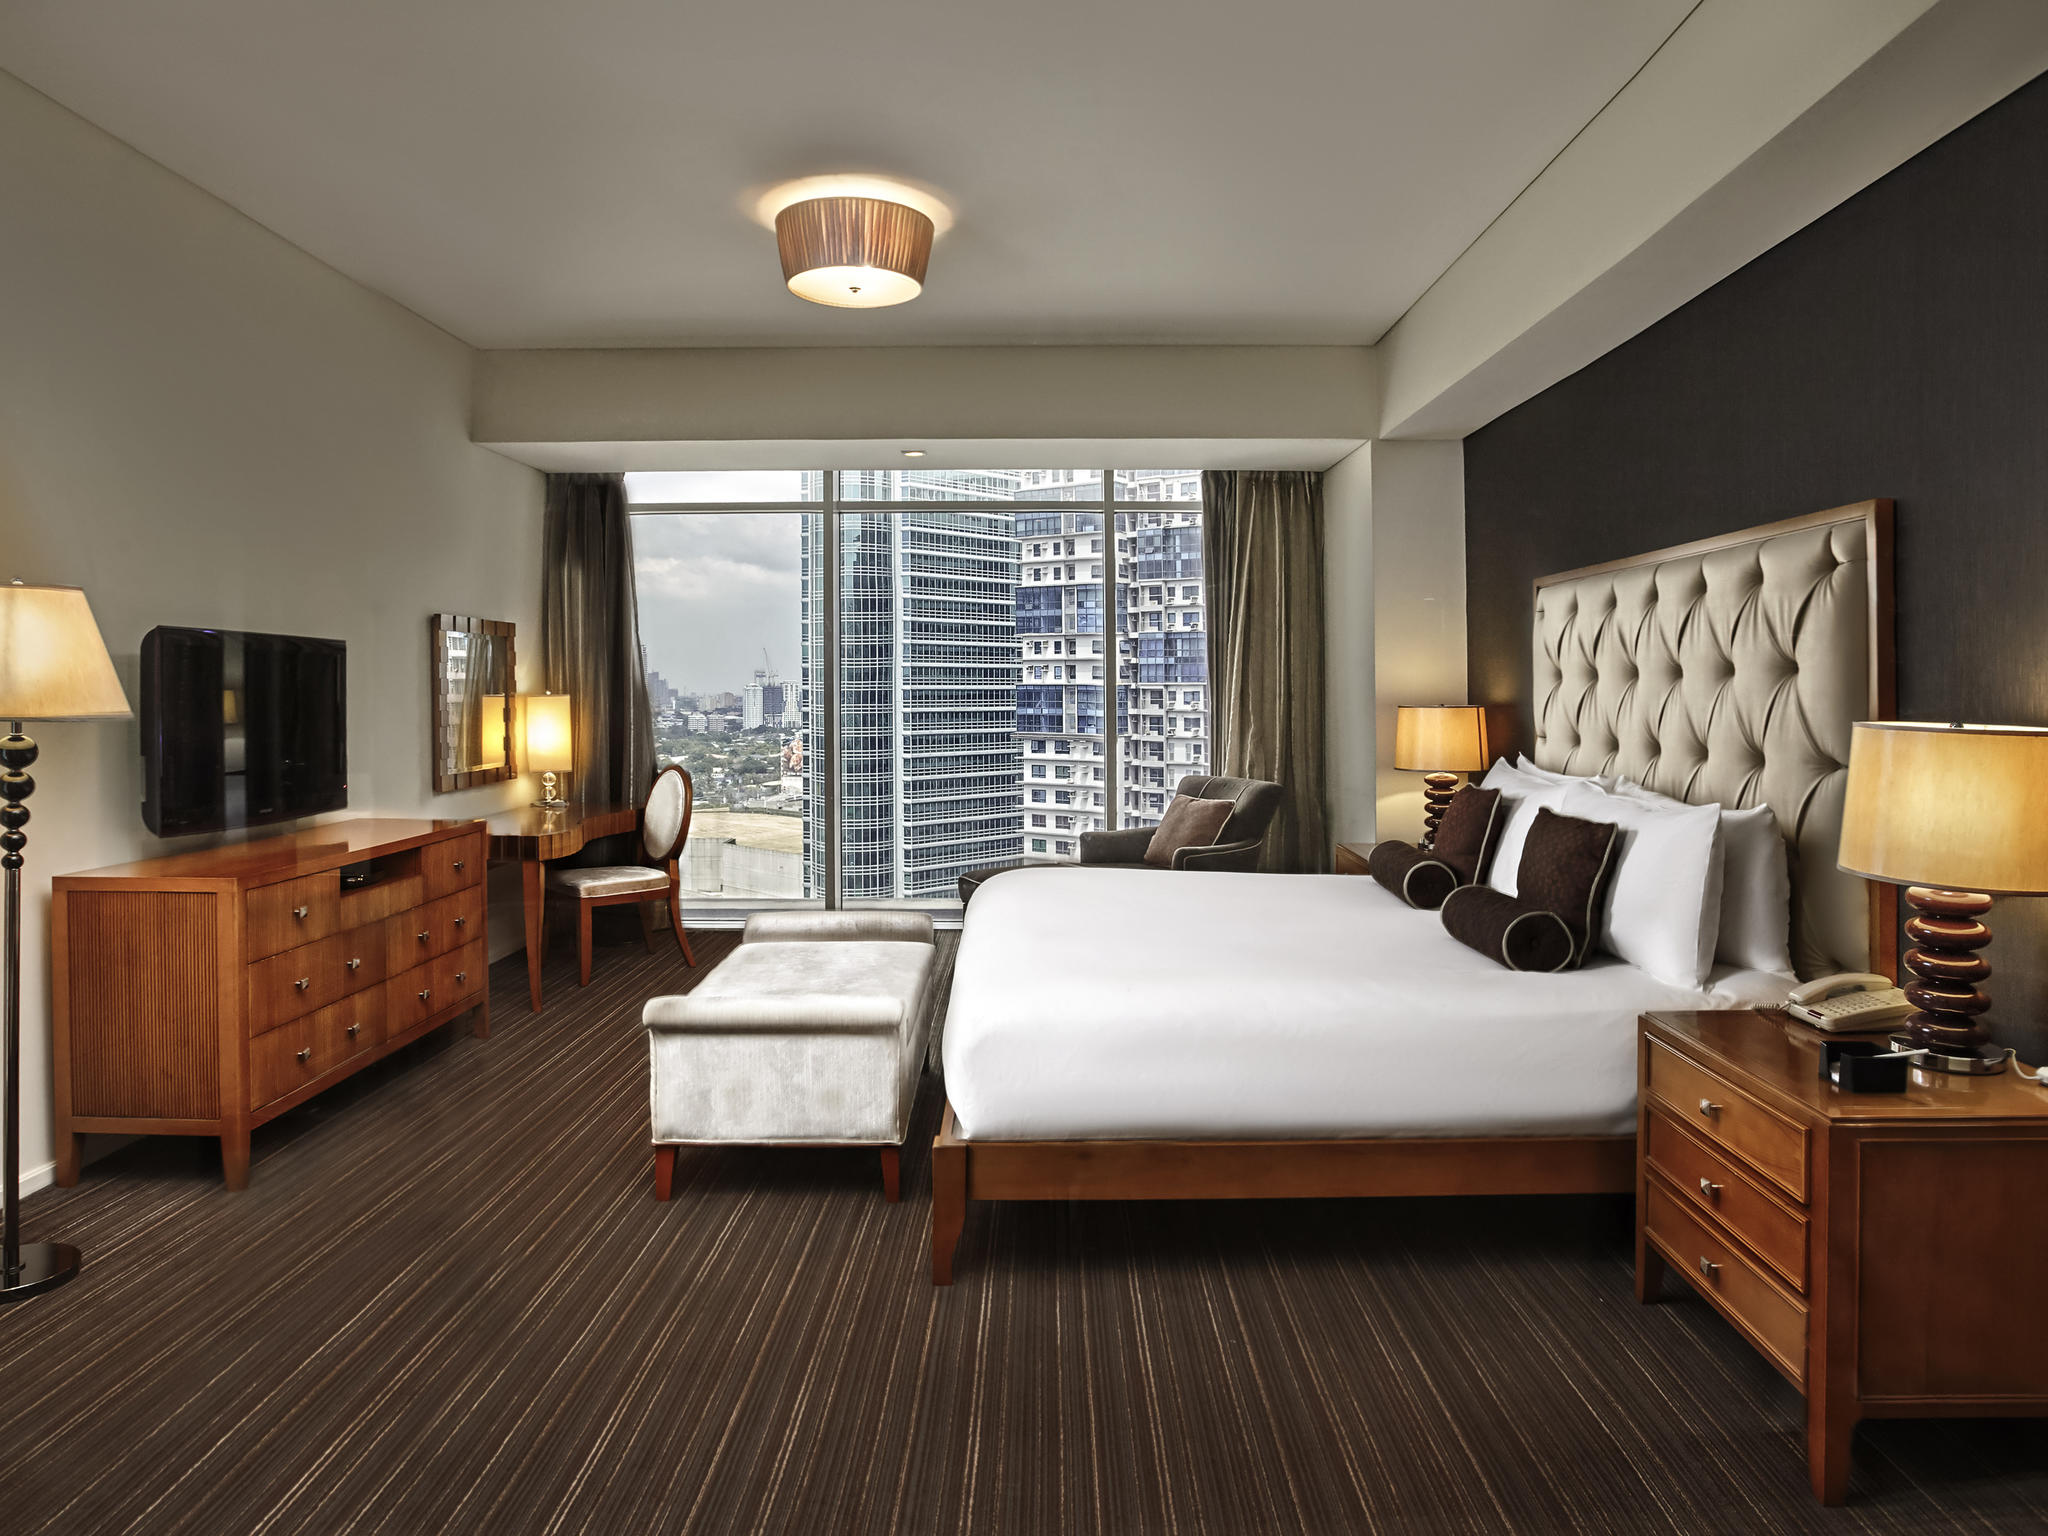 Hotel – Joy Nostalg Hotel & Suites Manila - Grupy AccorHotels